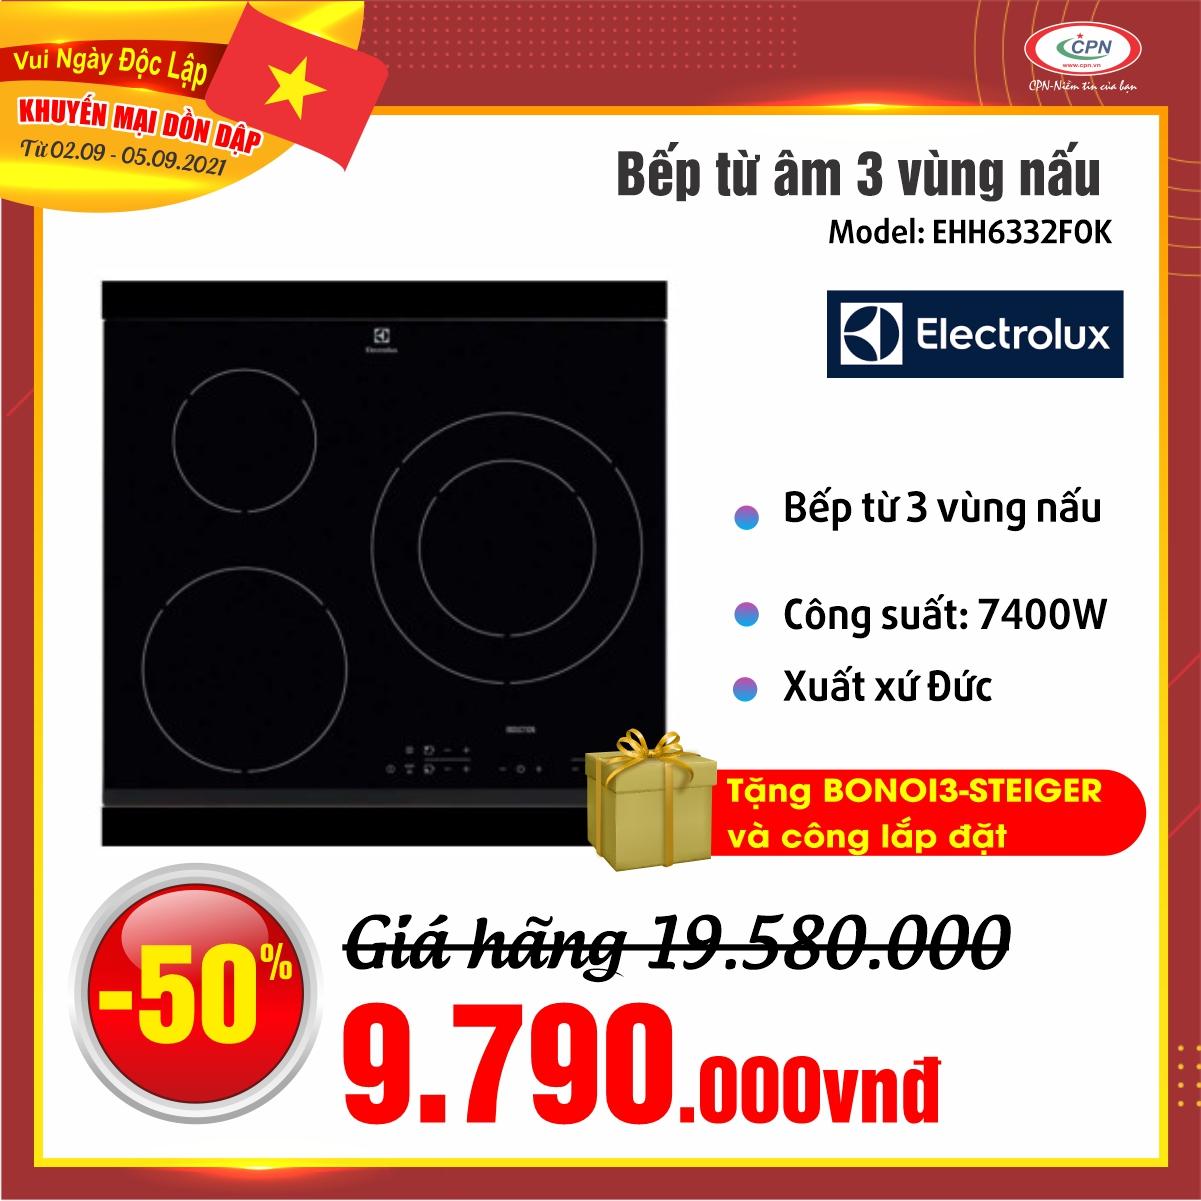 900x900-quoc-khanh-2021-ehh6332fok.jpg